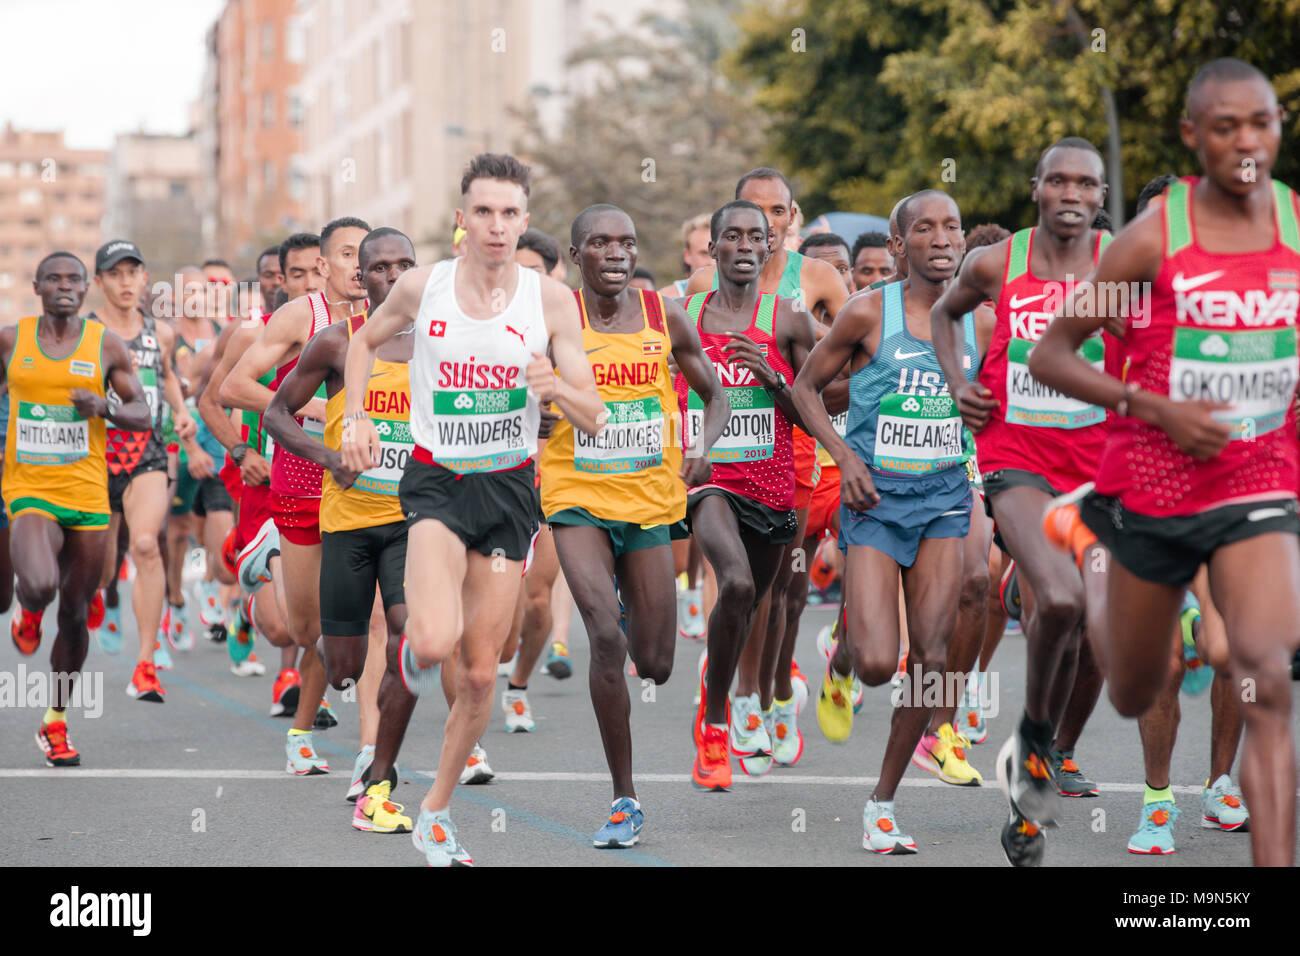 world Half Marathon, 24.05.2018, Valencia, spain, europe - Stock Image